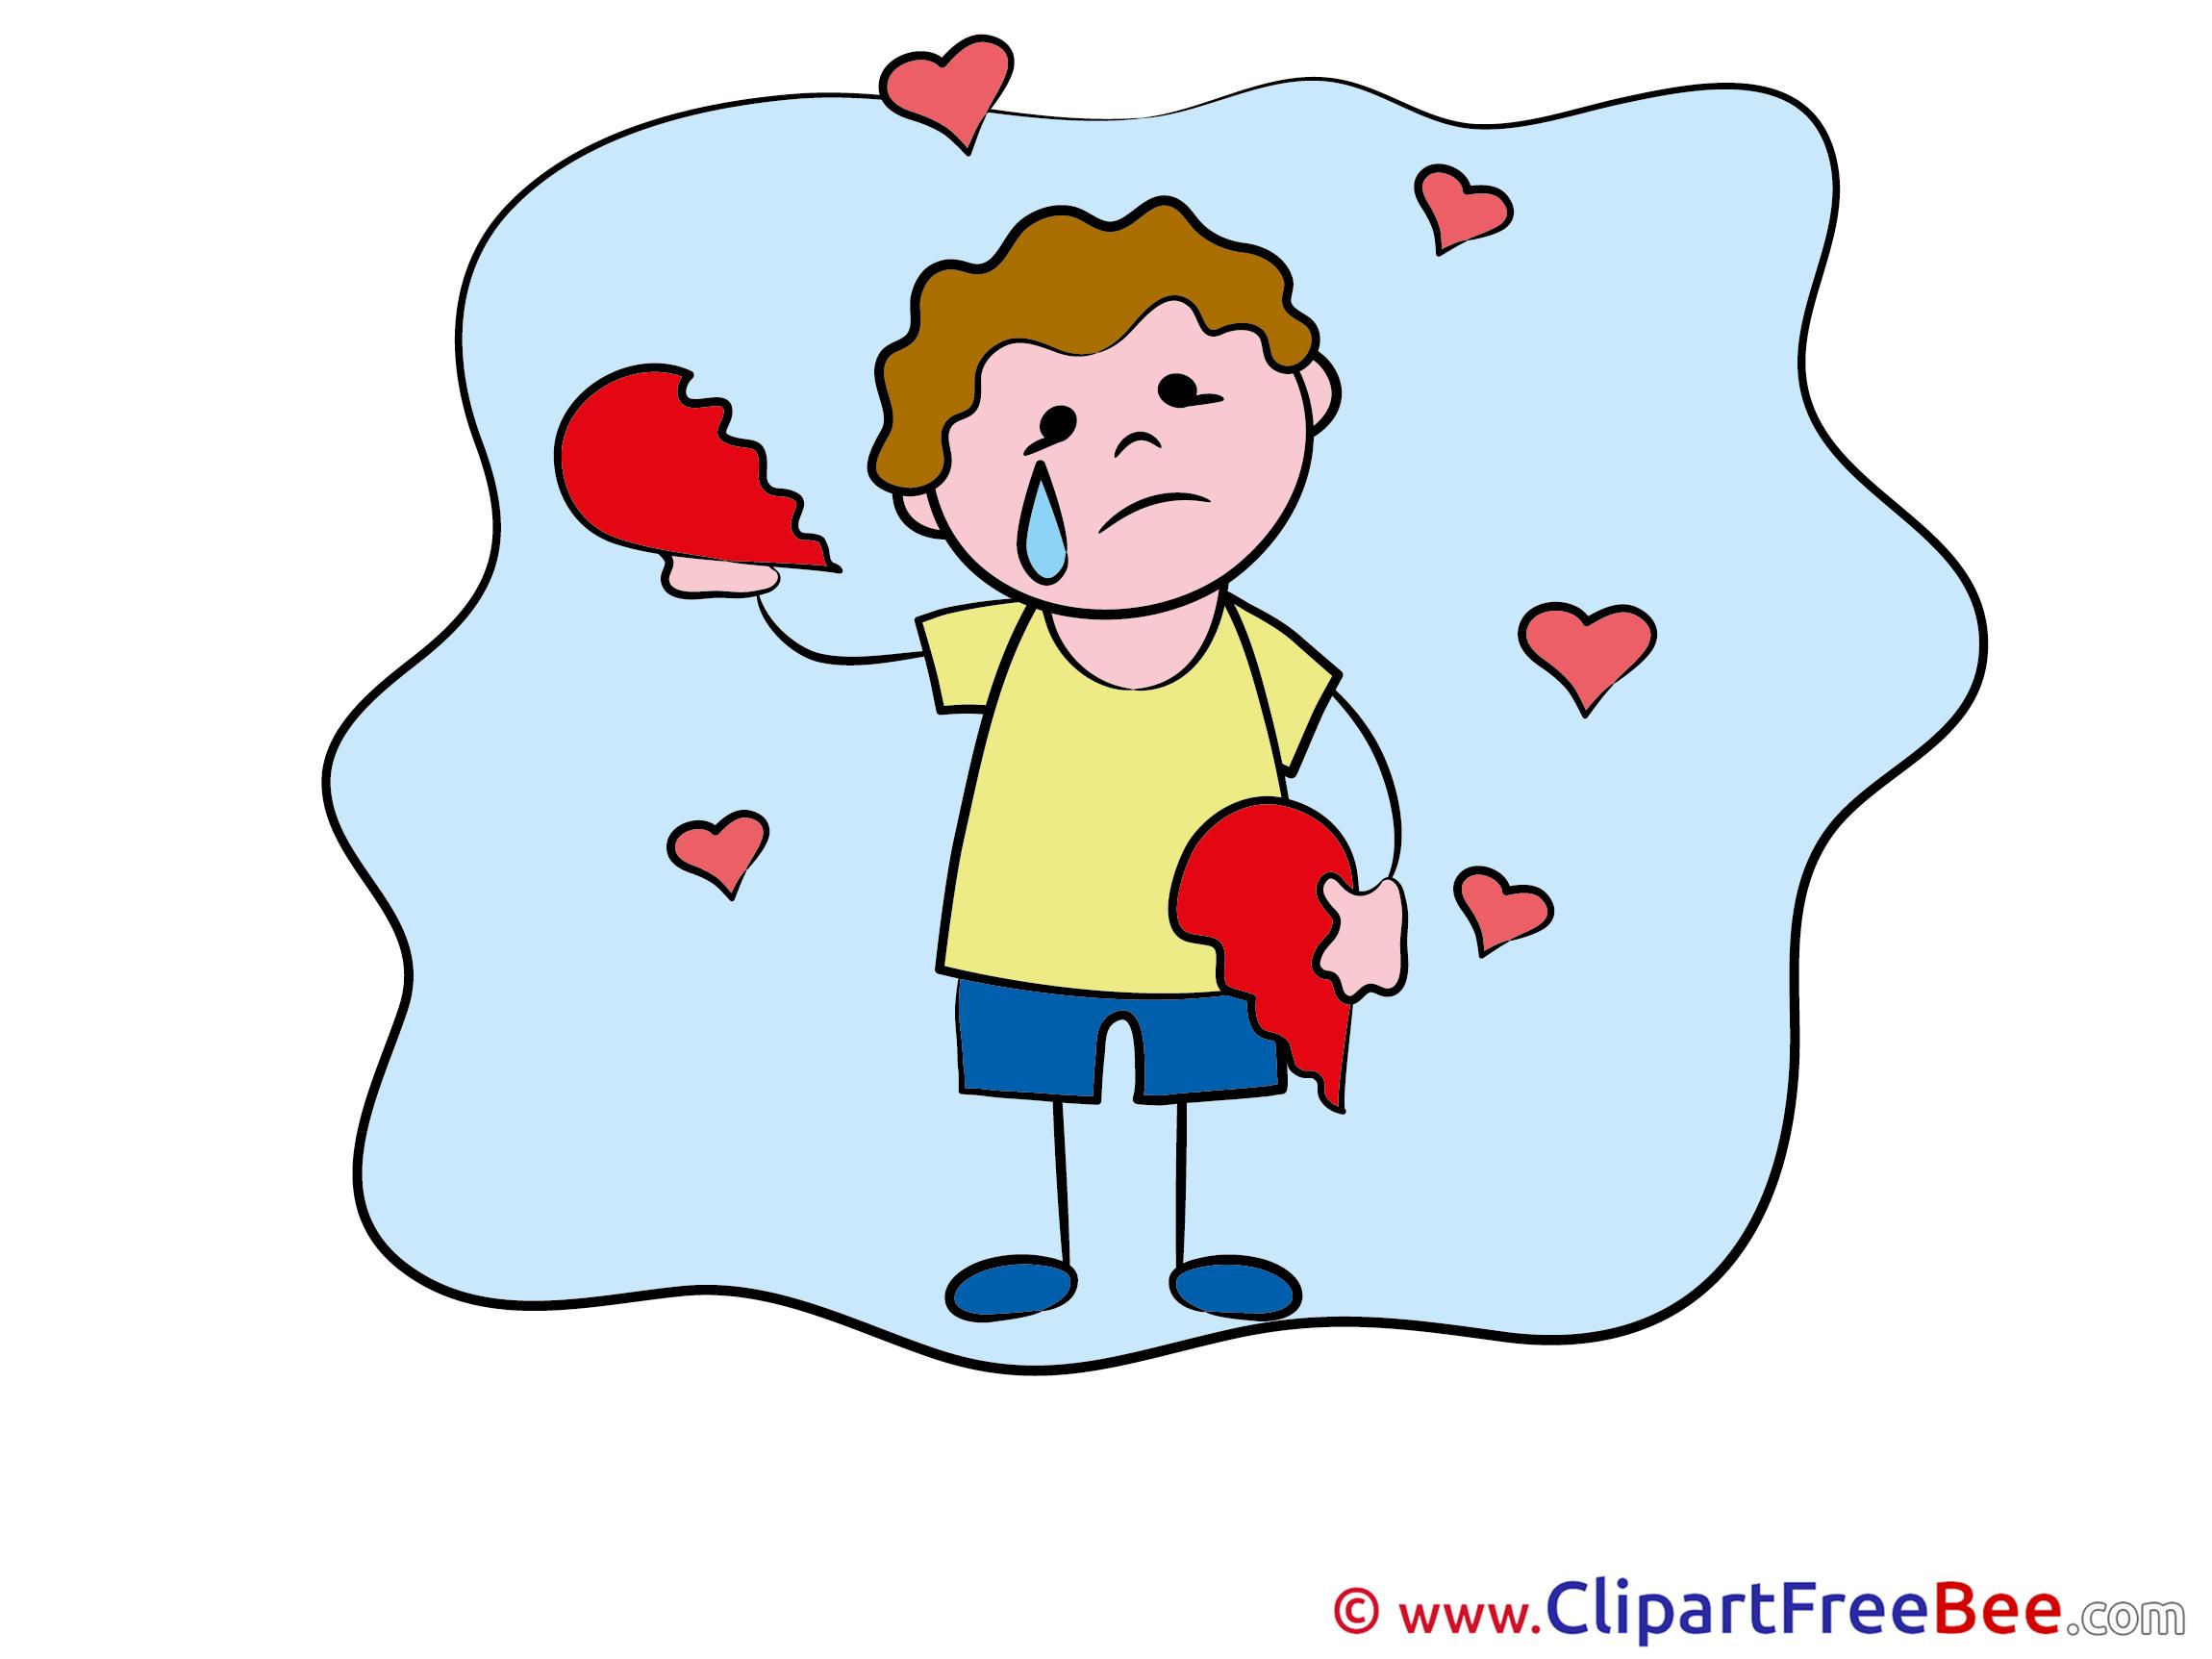 Boy broken heart pics goodbye free image voltagebd Choice Image